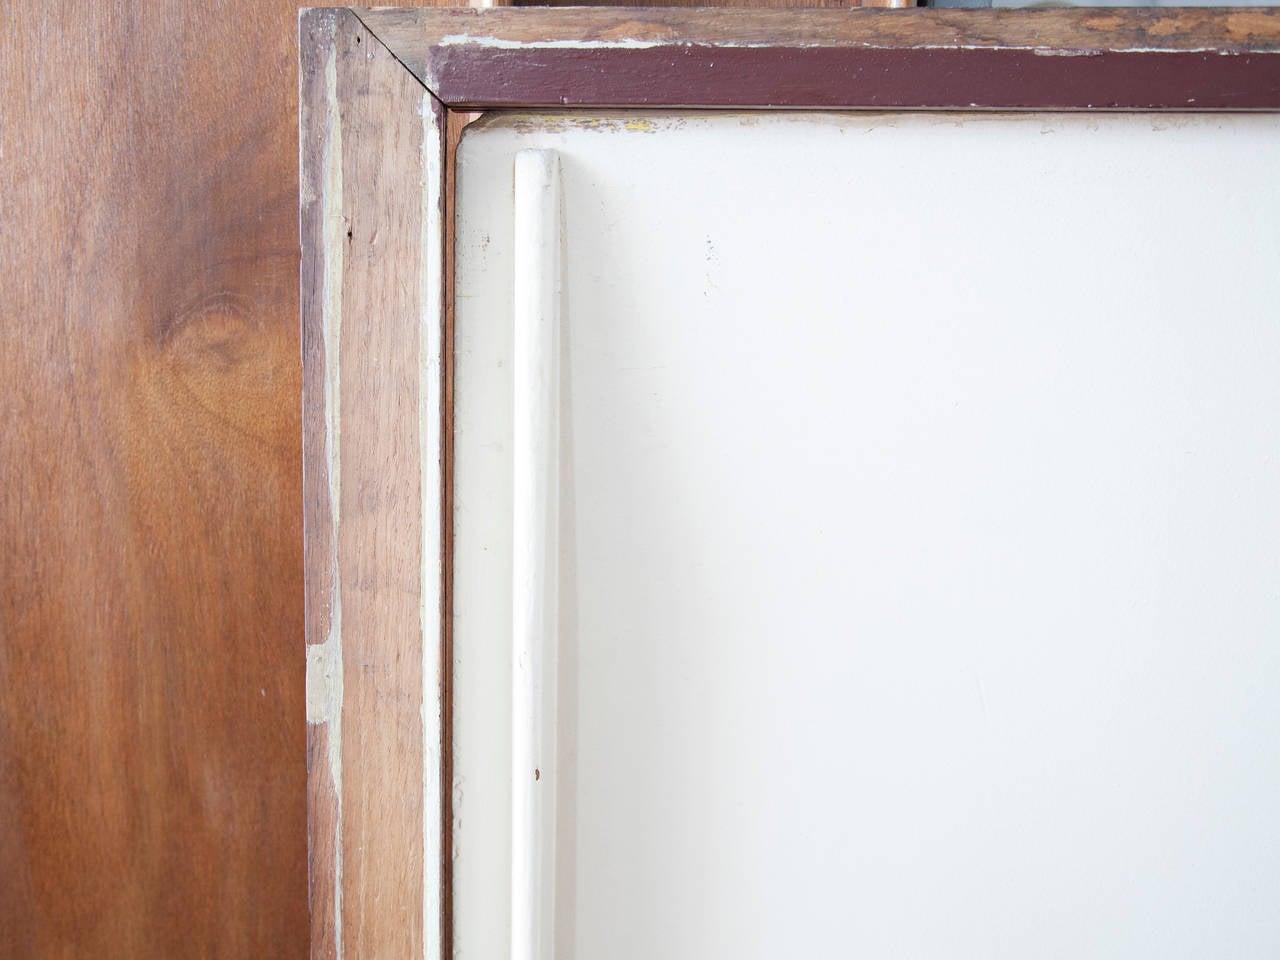 Jean Prouvé Sliding Cabinet Doors in Frames 4